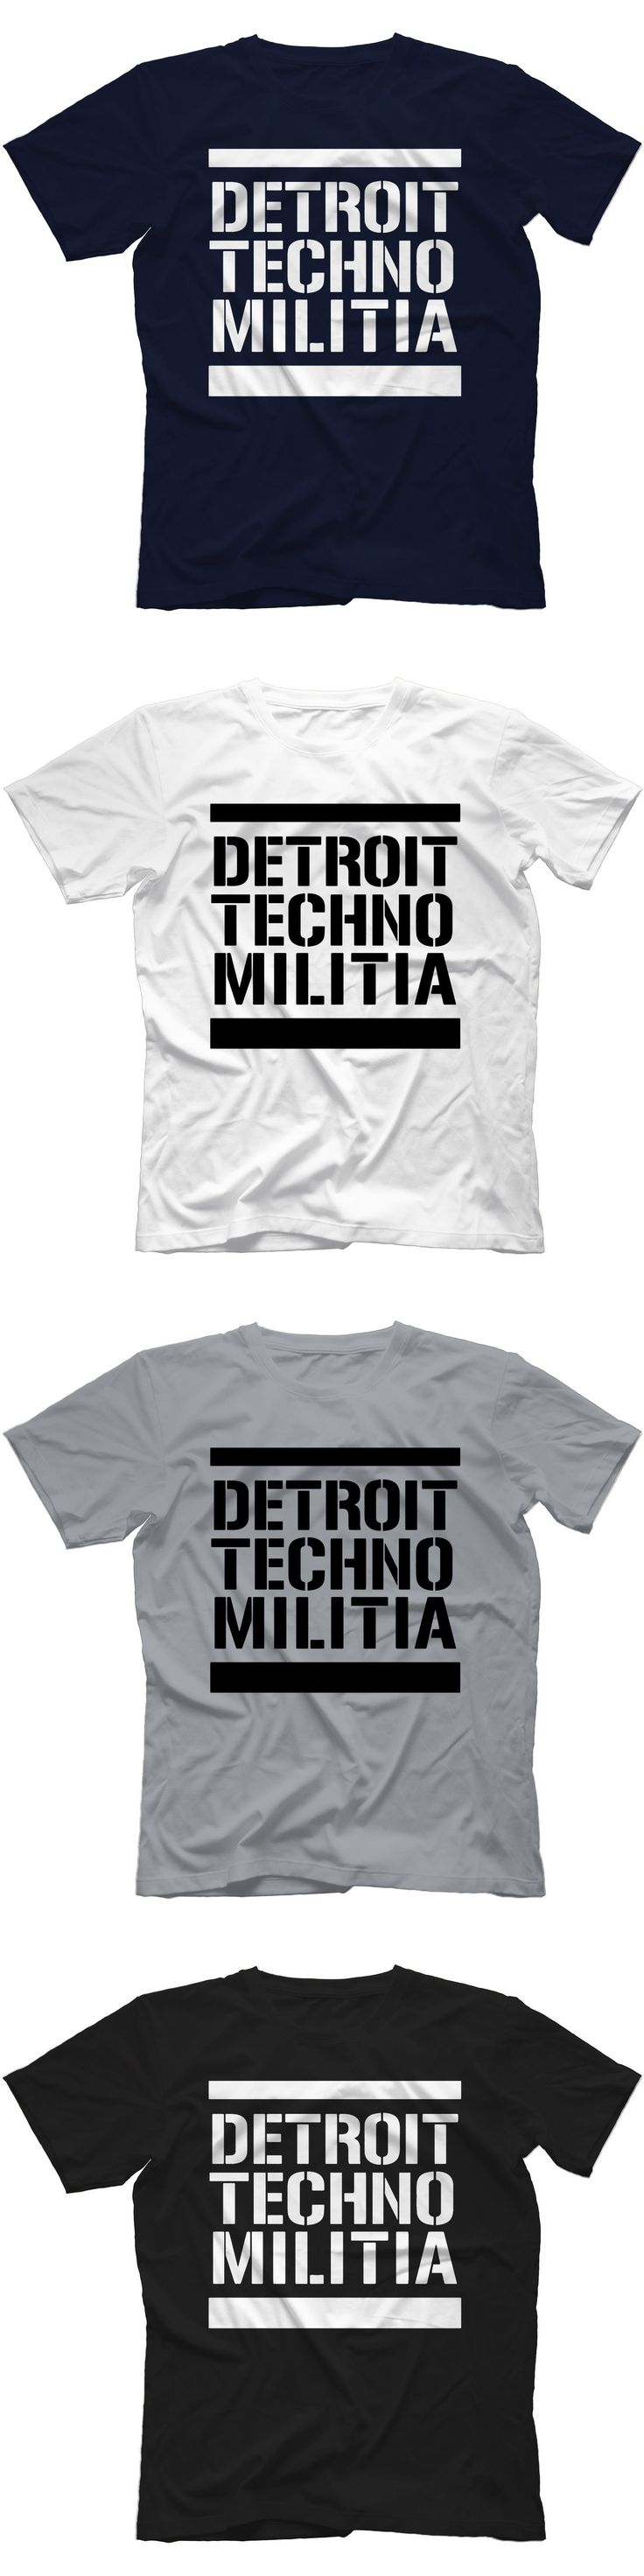 "Detroit Techno Militia T-Shirt 100% Cotton Vinyl 909 Underground Resistance ""Sleeves Cotton Fashion T Shirt Free Shipping """